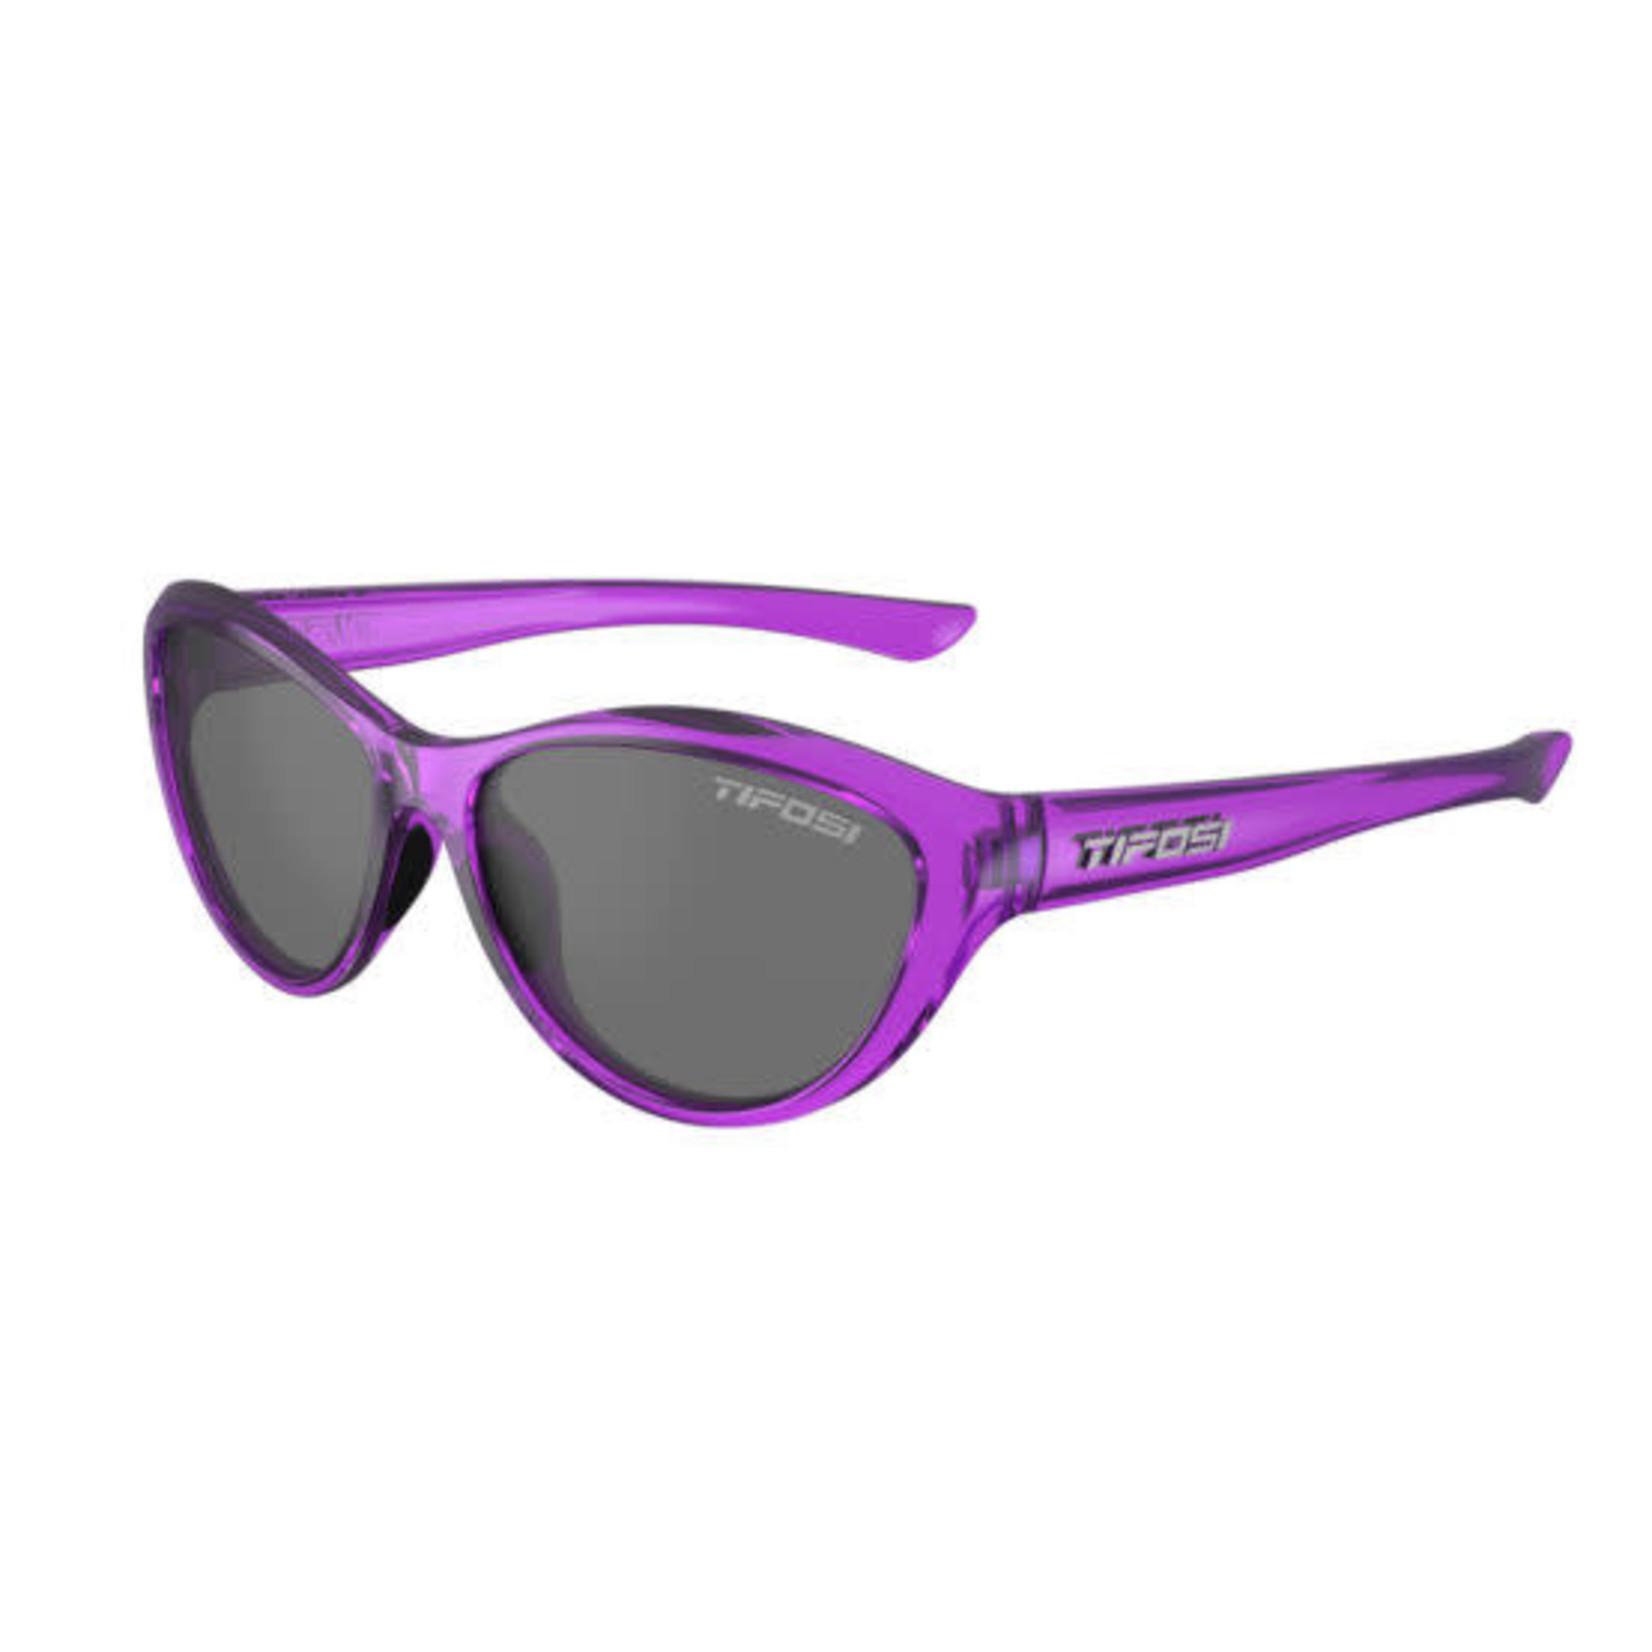 Tifosi Optics Shirley, Crystal Ultraviolet Single Lens Sunglasses